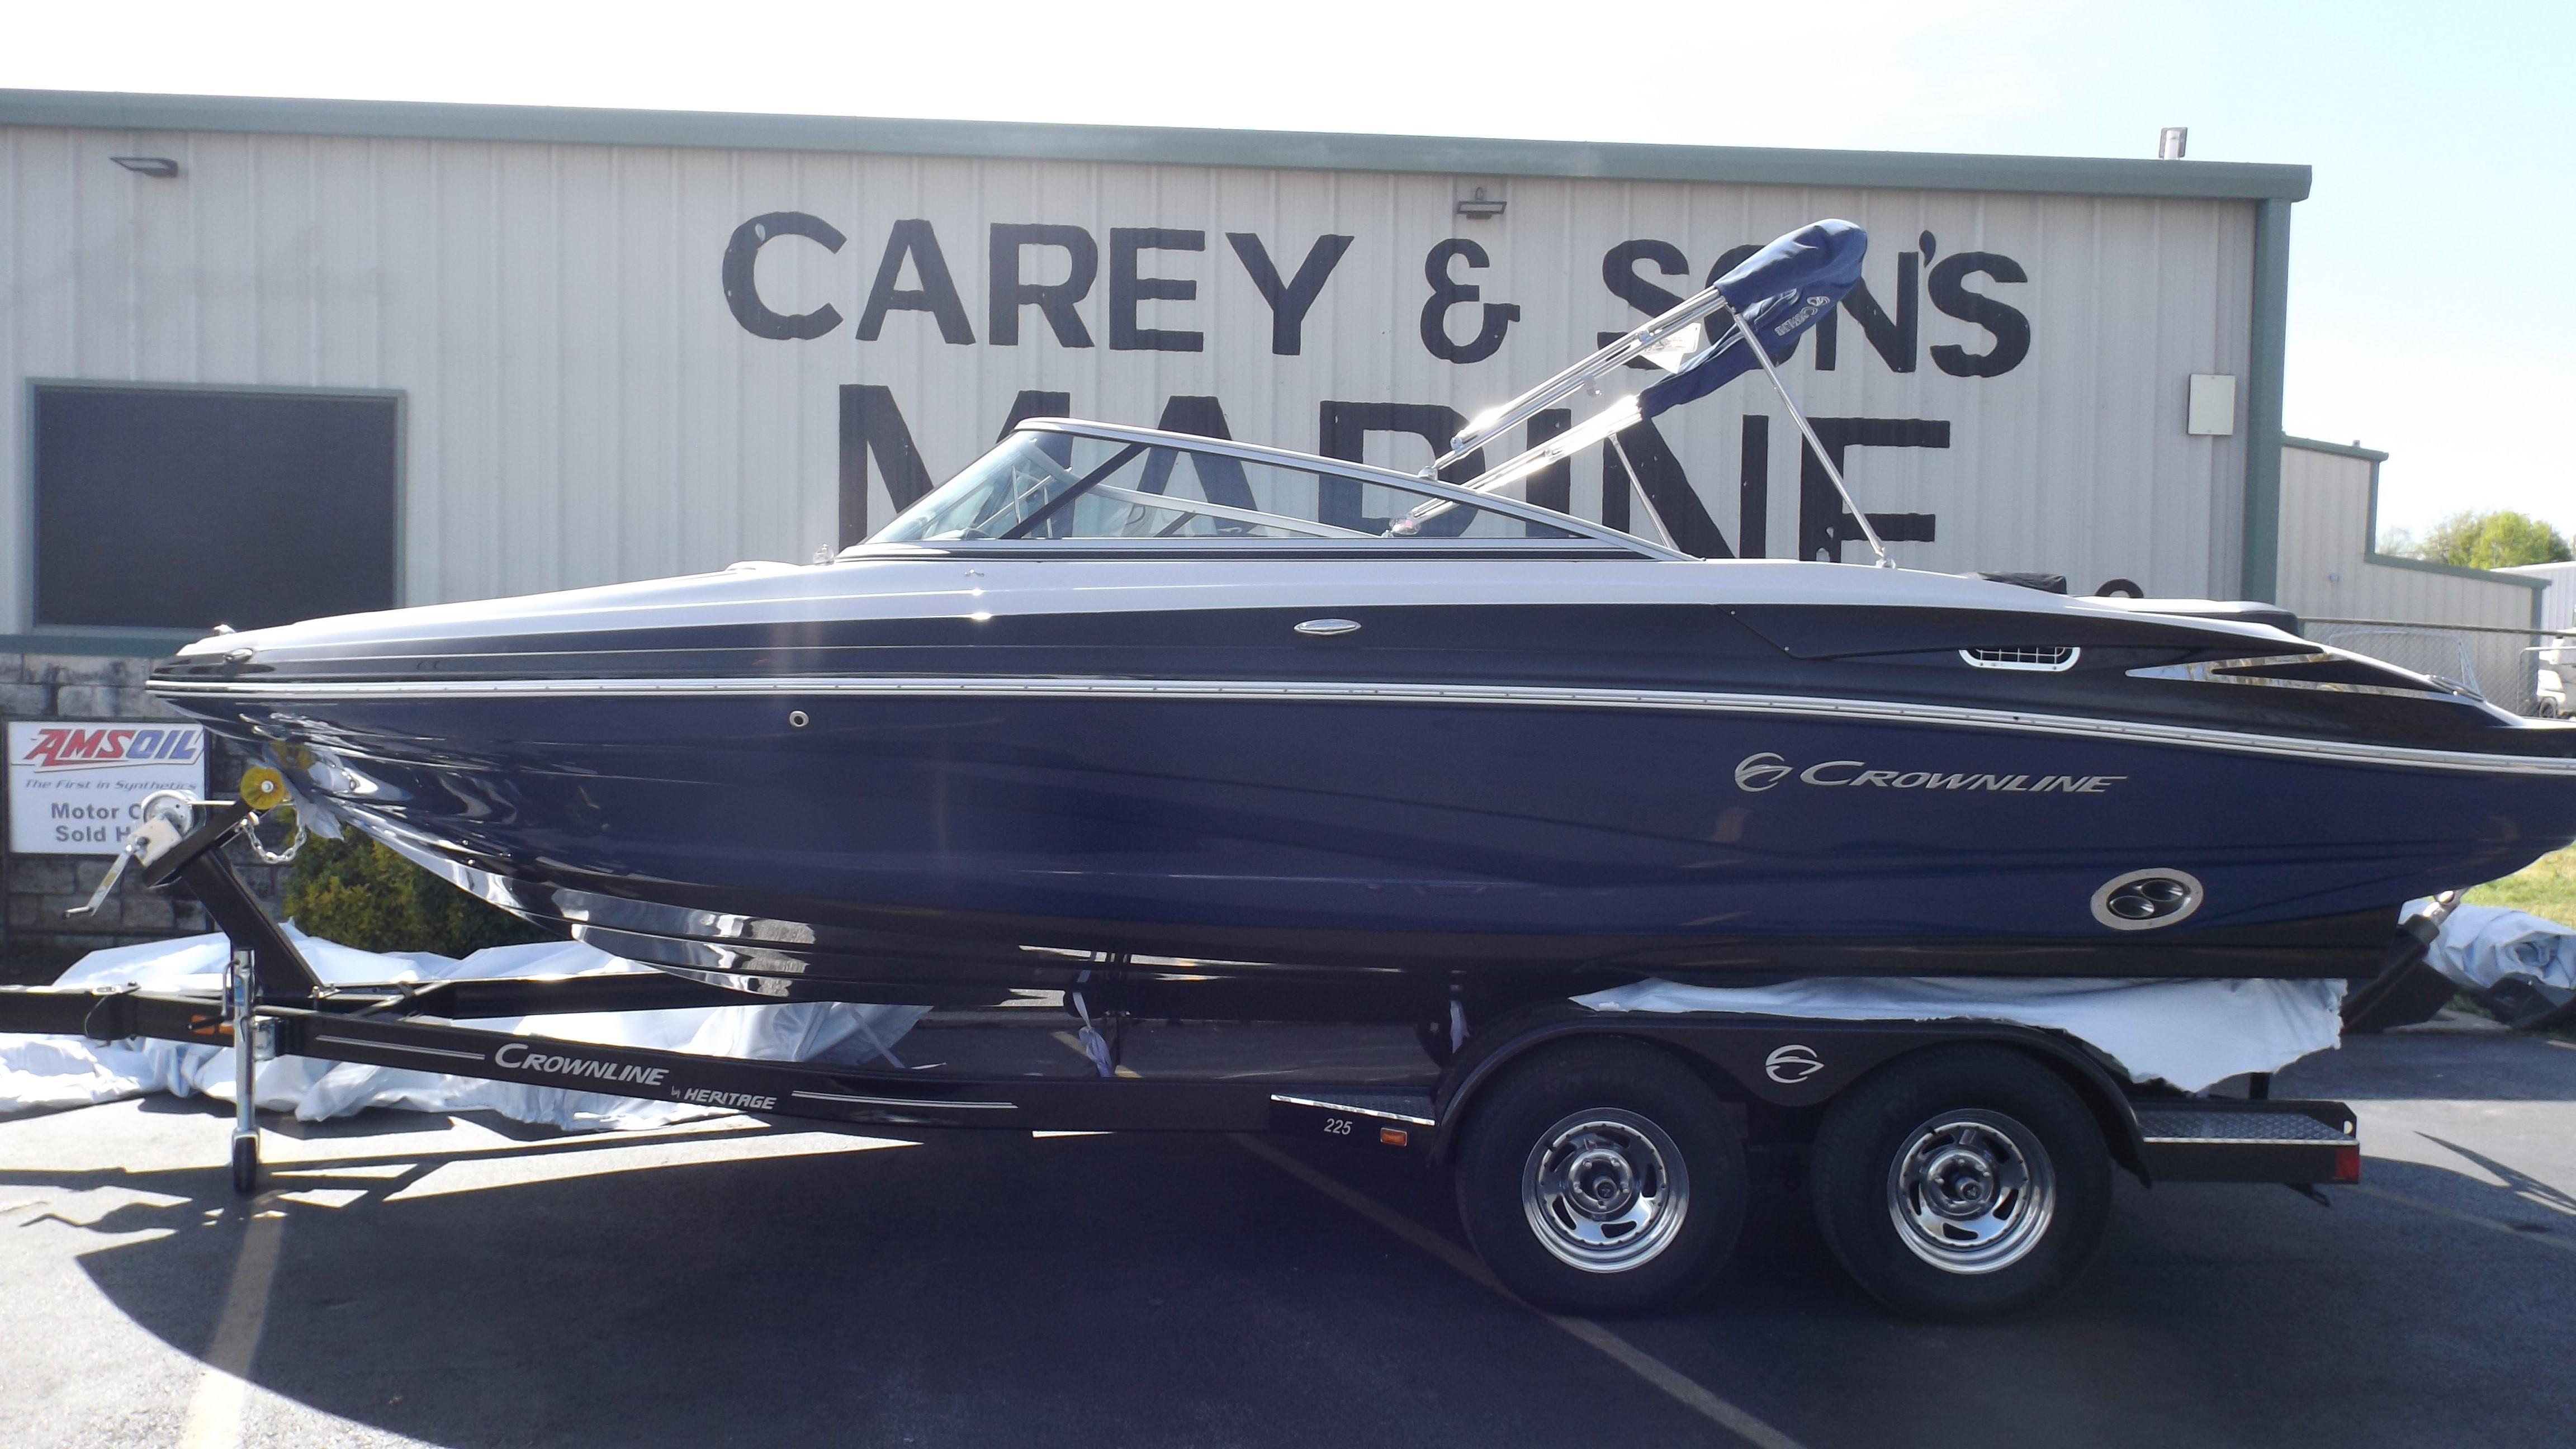 2019 Crownline 225 SS Granbury, Texas - Carey & Sons Marine